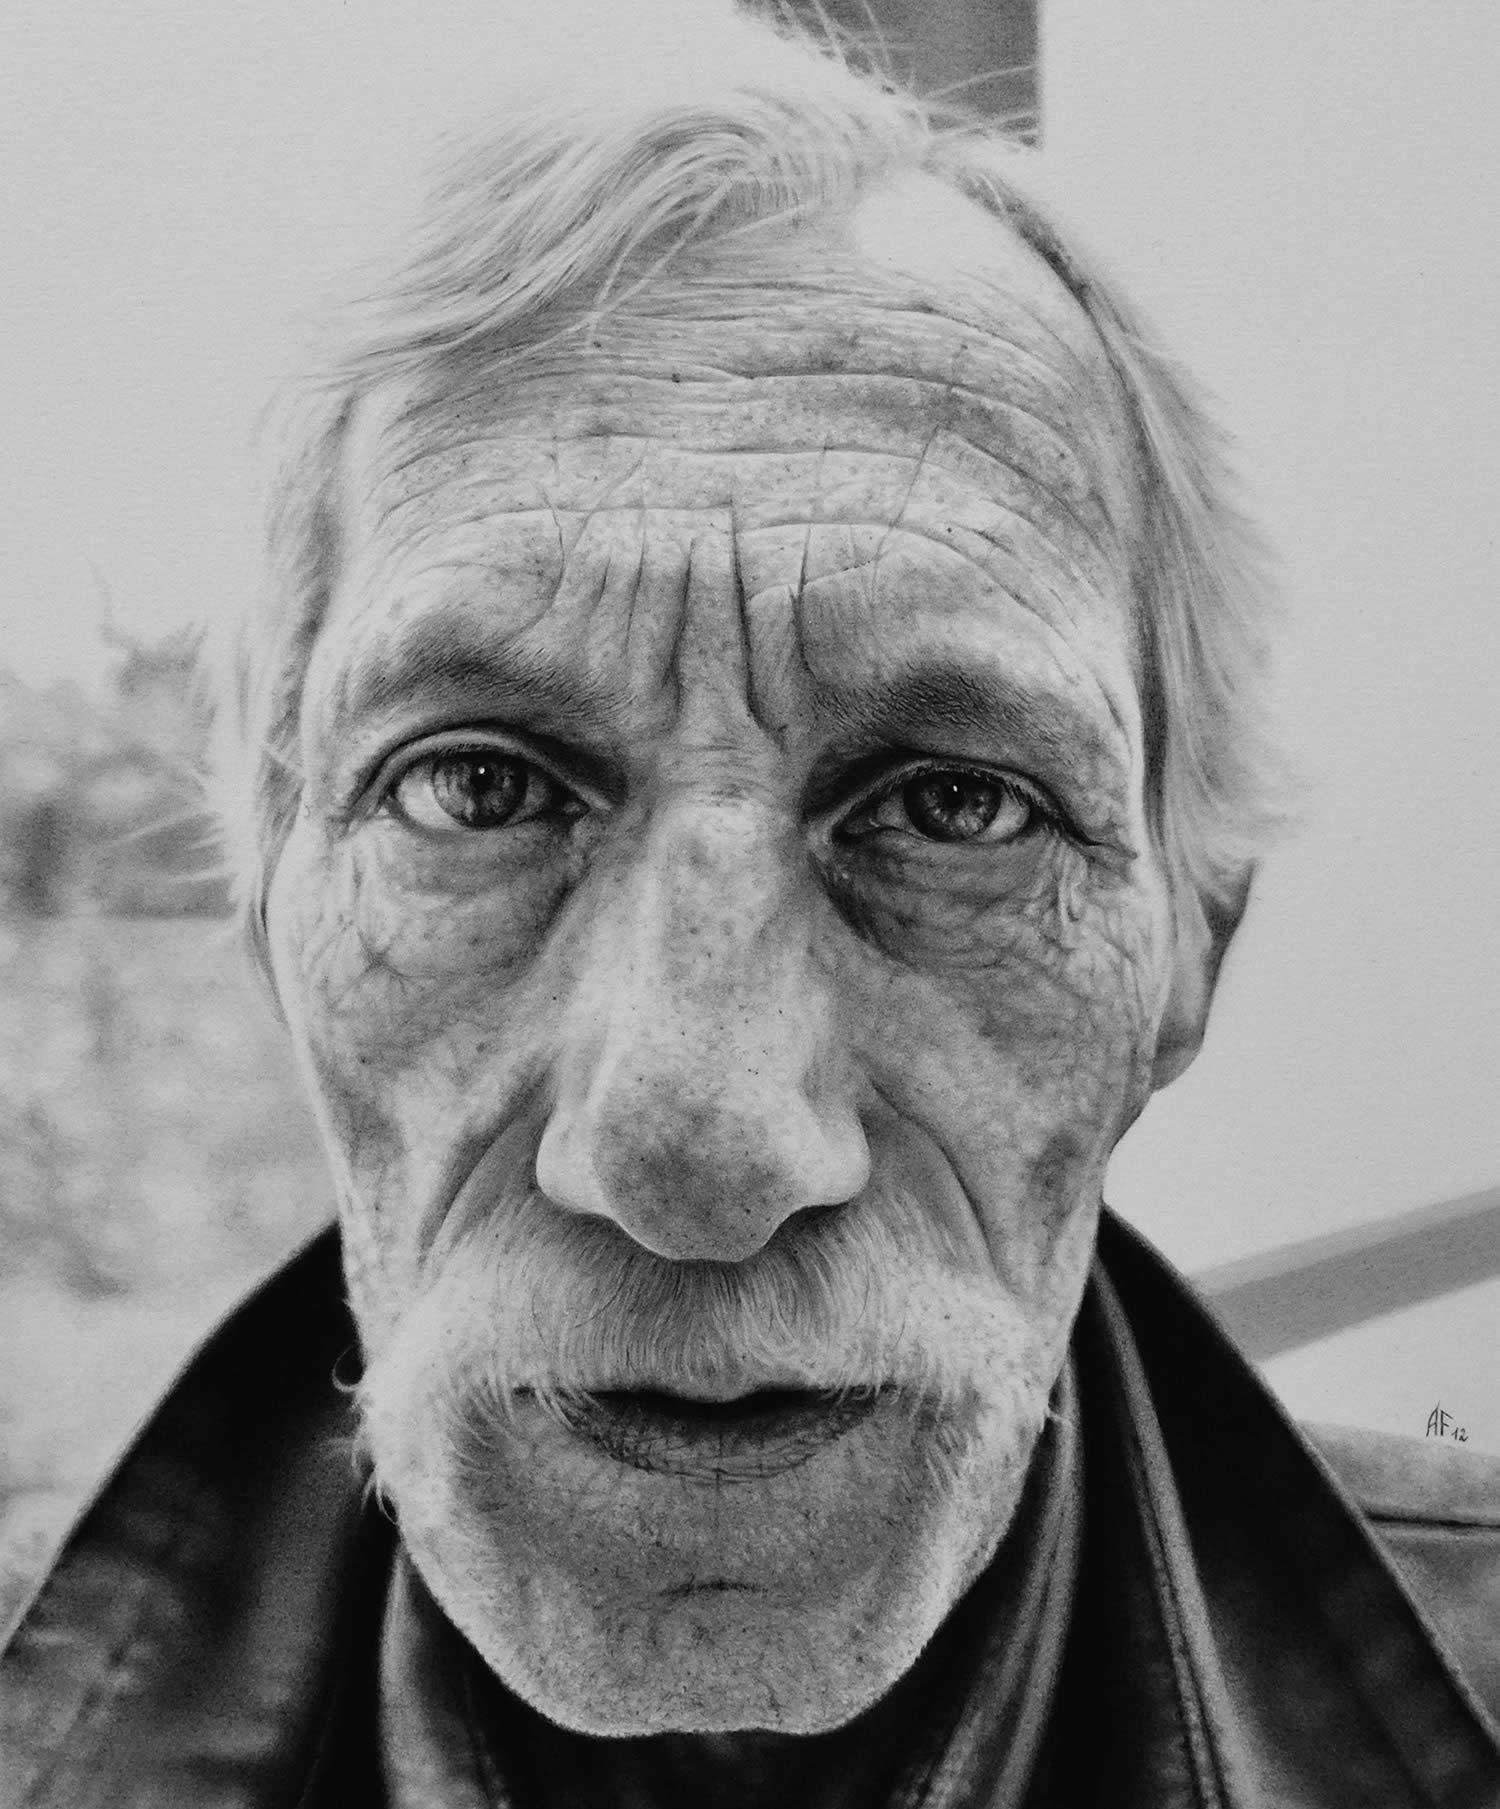 hyperrealist art by antonio finelli, man with moustache